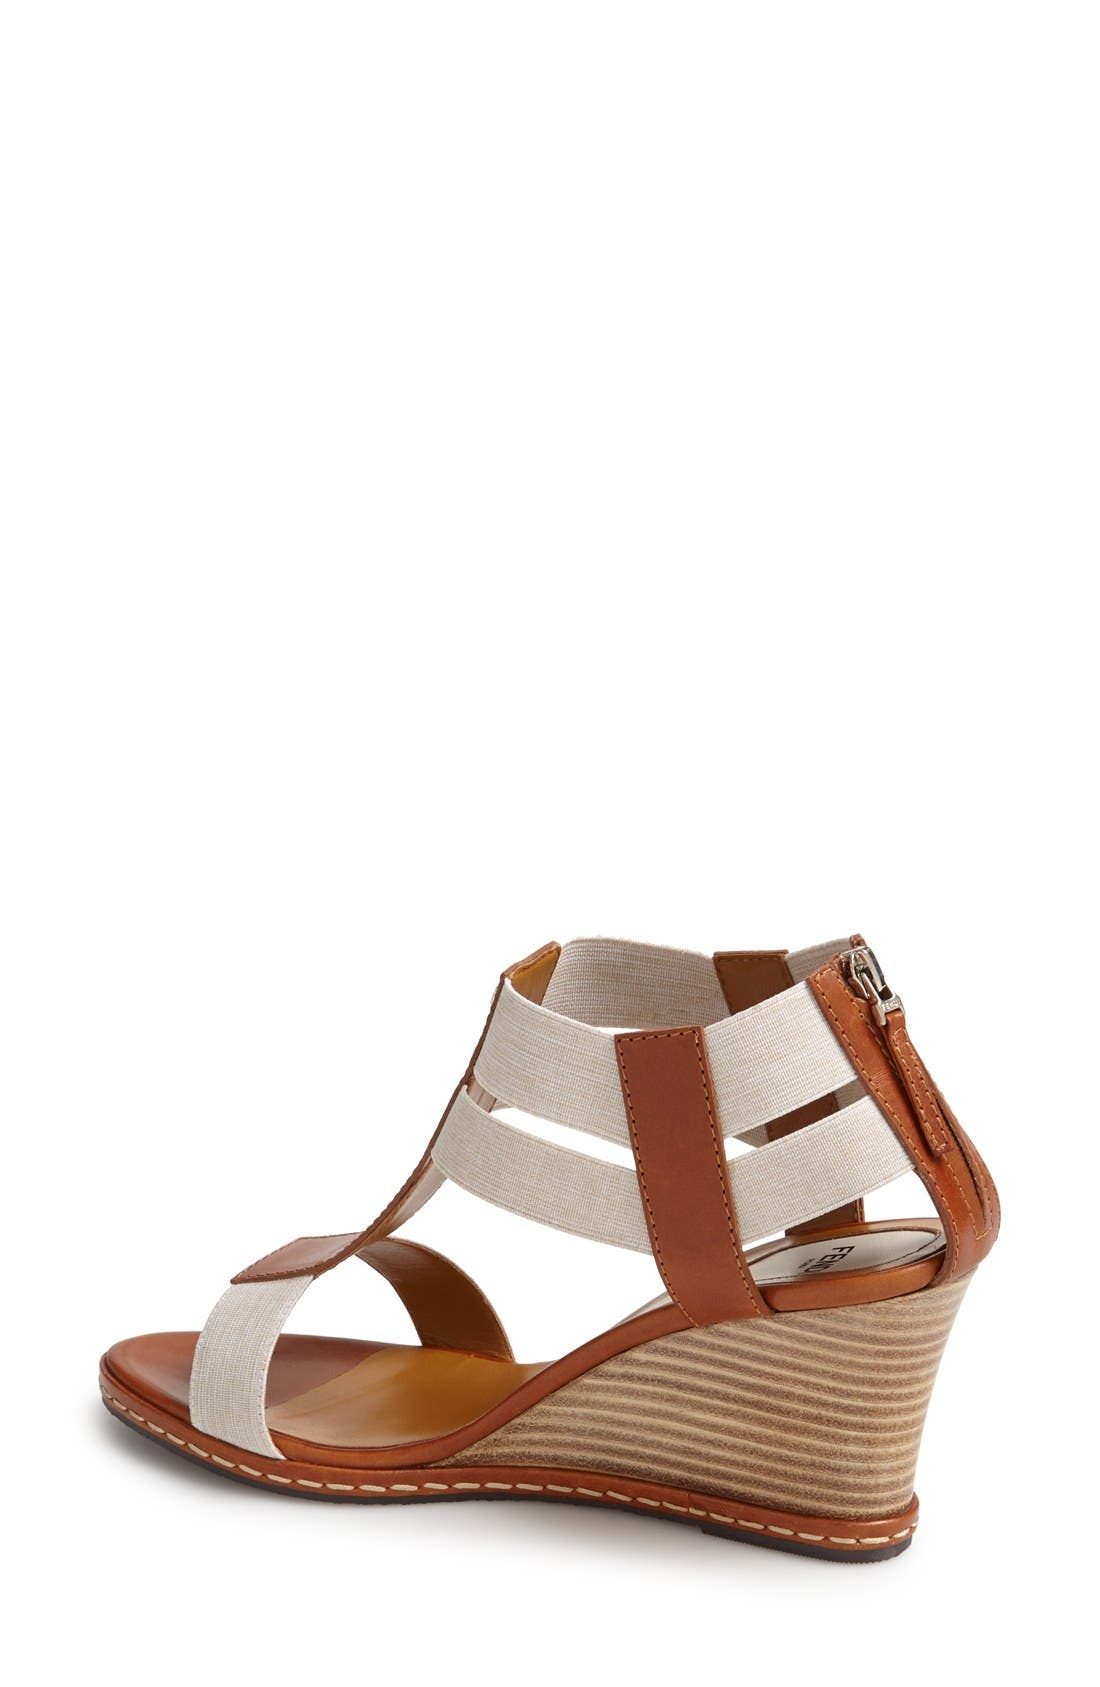 Alternate Image 2  - Fendi 'Carioca' Wedge Sandal (Women)